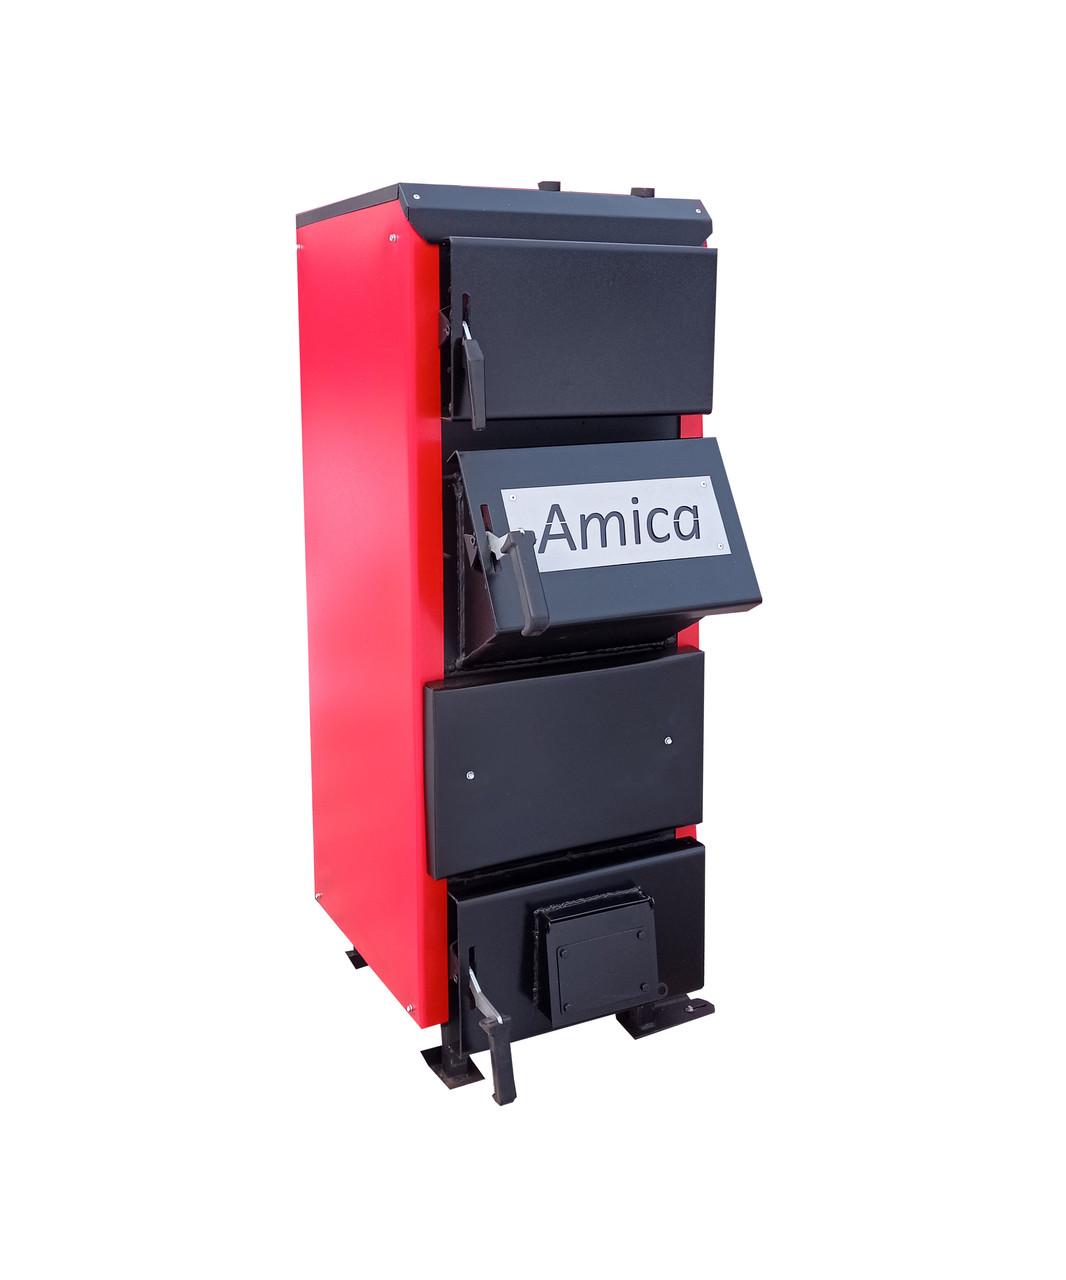 Котли Amica Trend твердопаливний 24 кВт. Безкоштовна доставка!